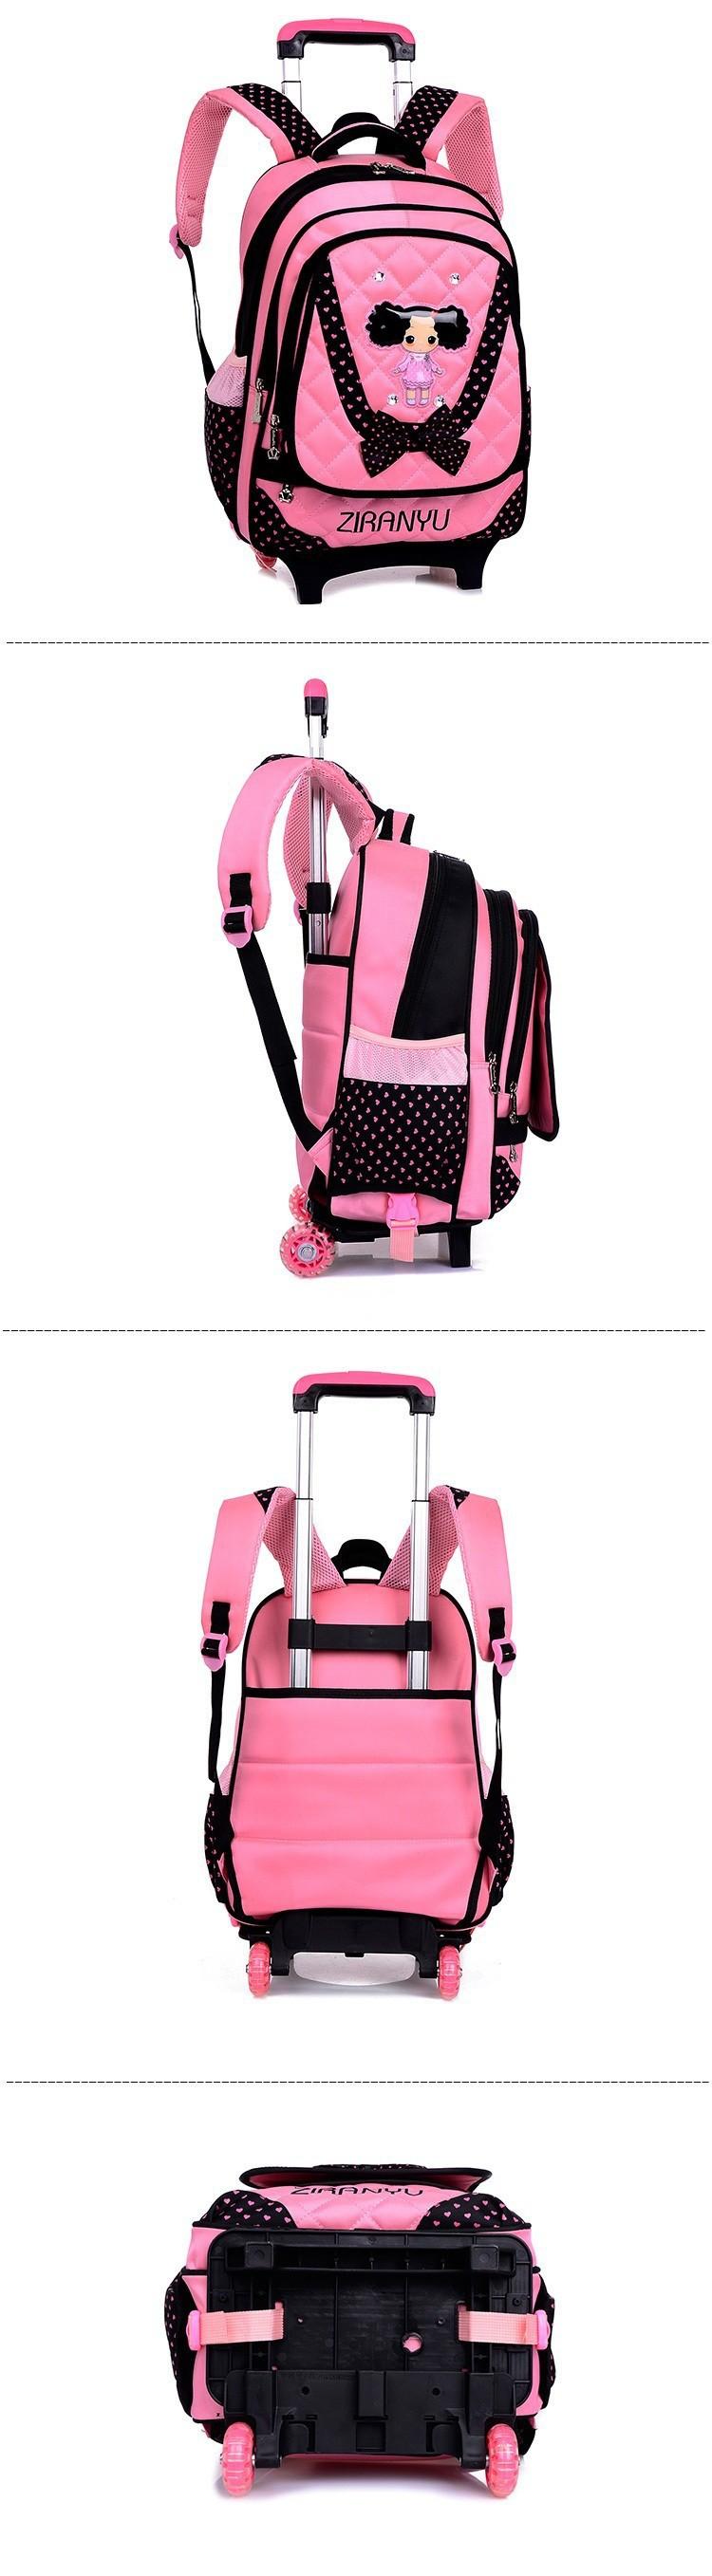 kids-wheeled-school-backpack-children-school-trolley-backpack-carton-pattern-rolling-luggage-kids-detachable-and-orthopedic-4